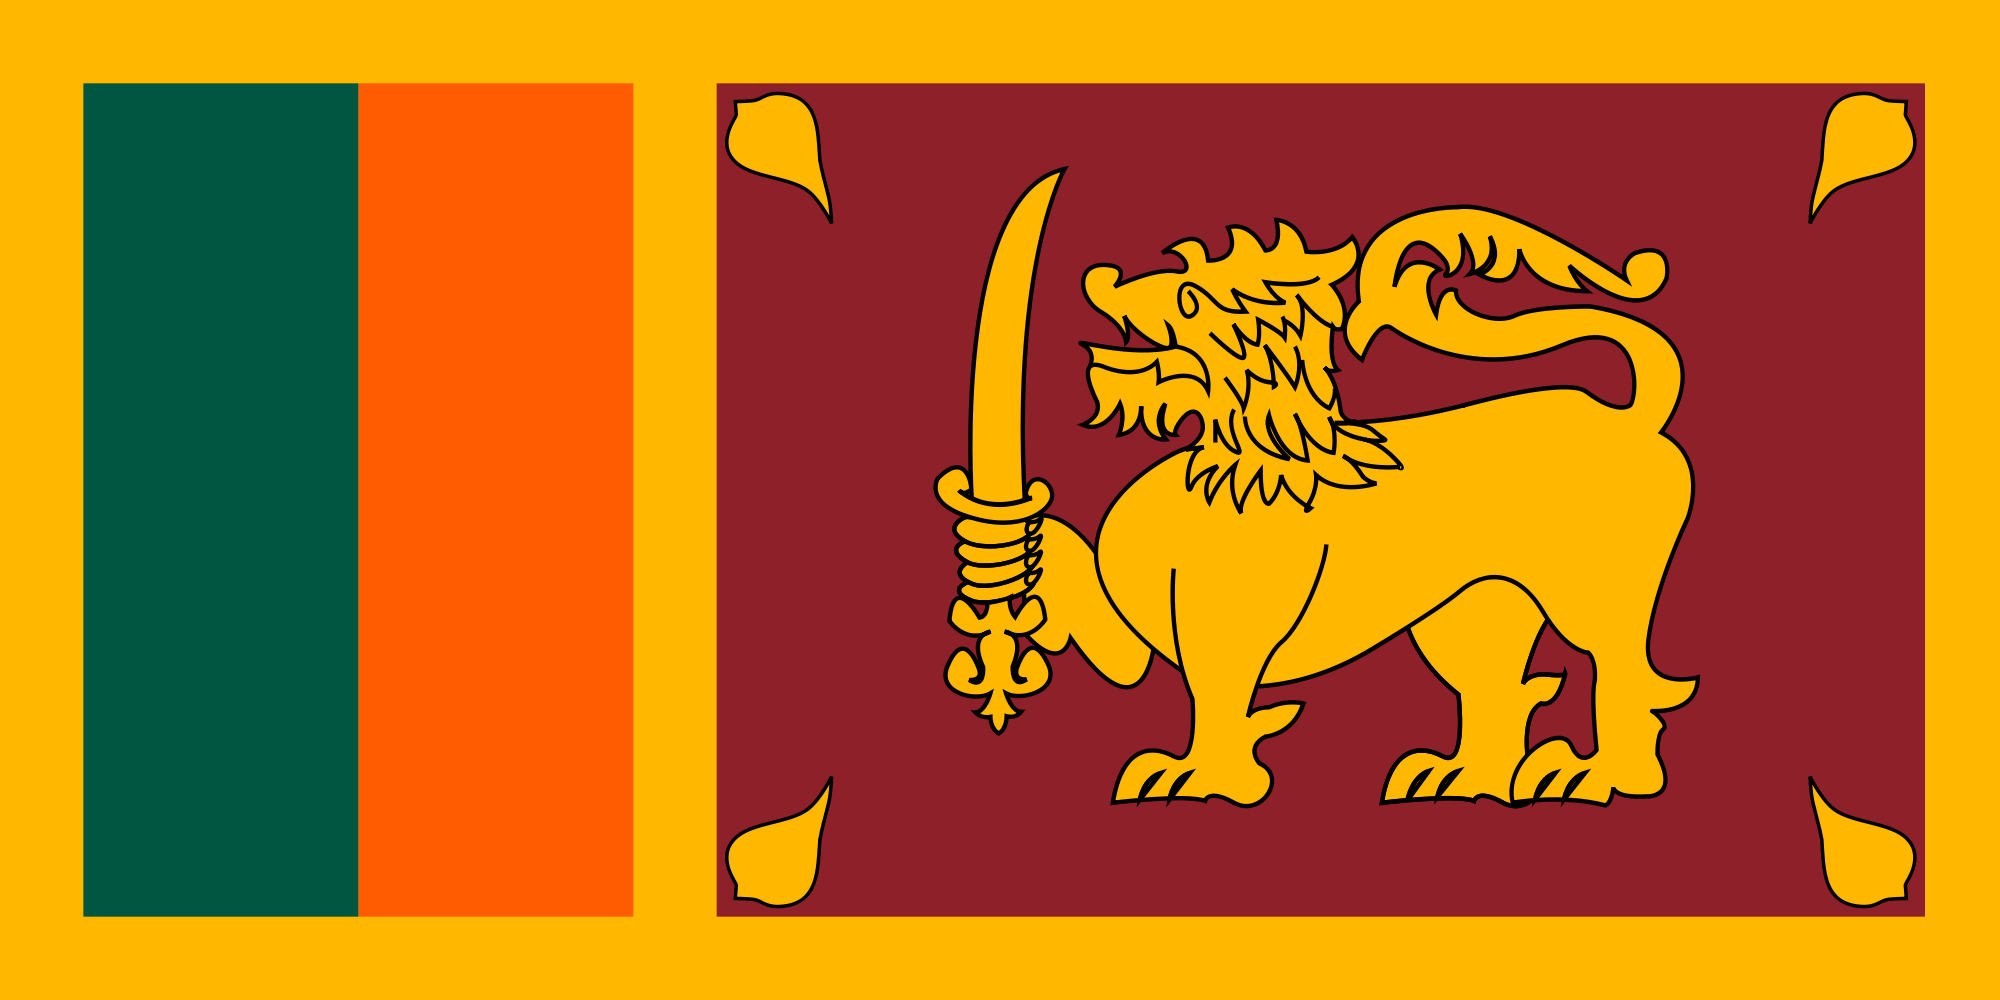 Travcour Visa & Legalisation Services Limited Sri Lanka Visa Application